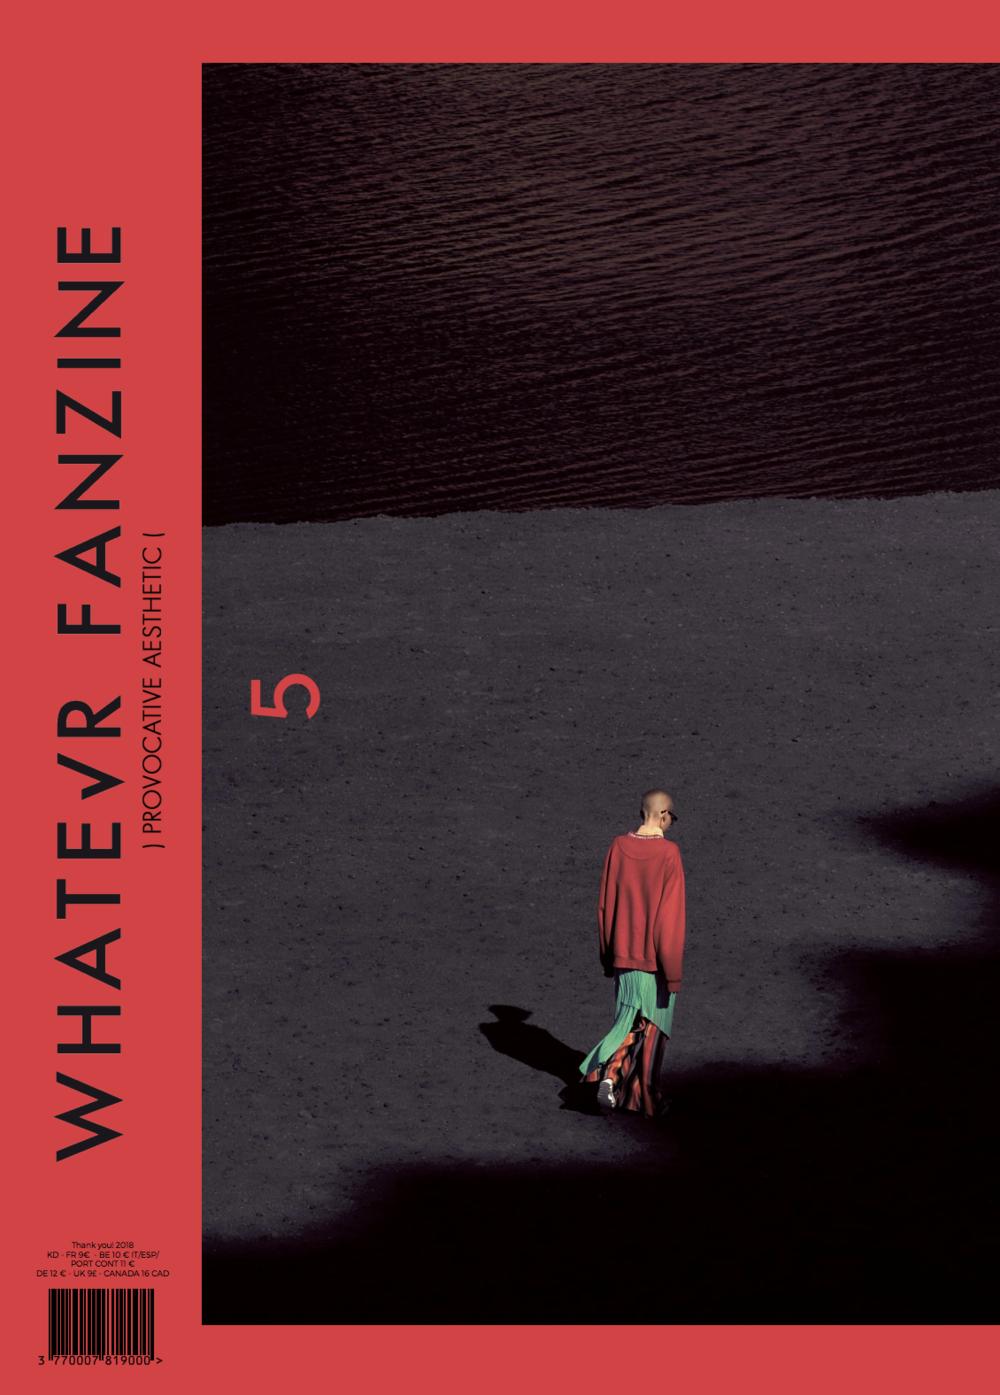 Whatever Magazine Cover